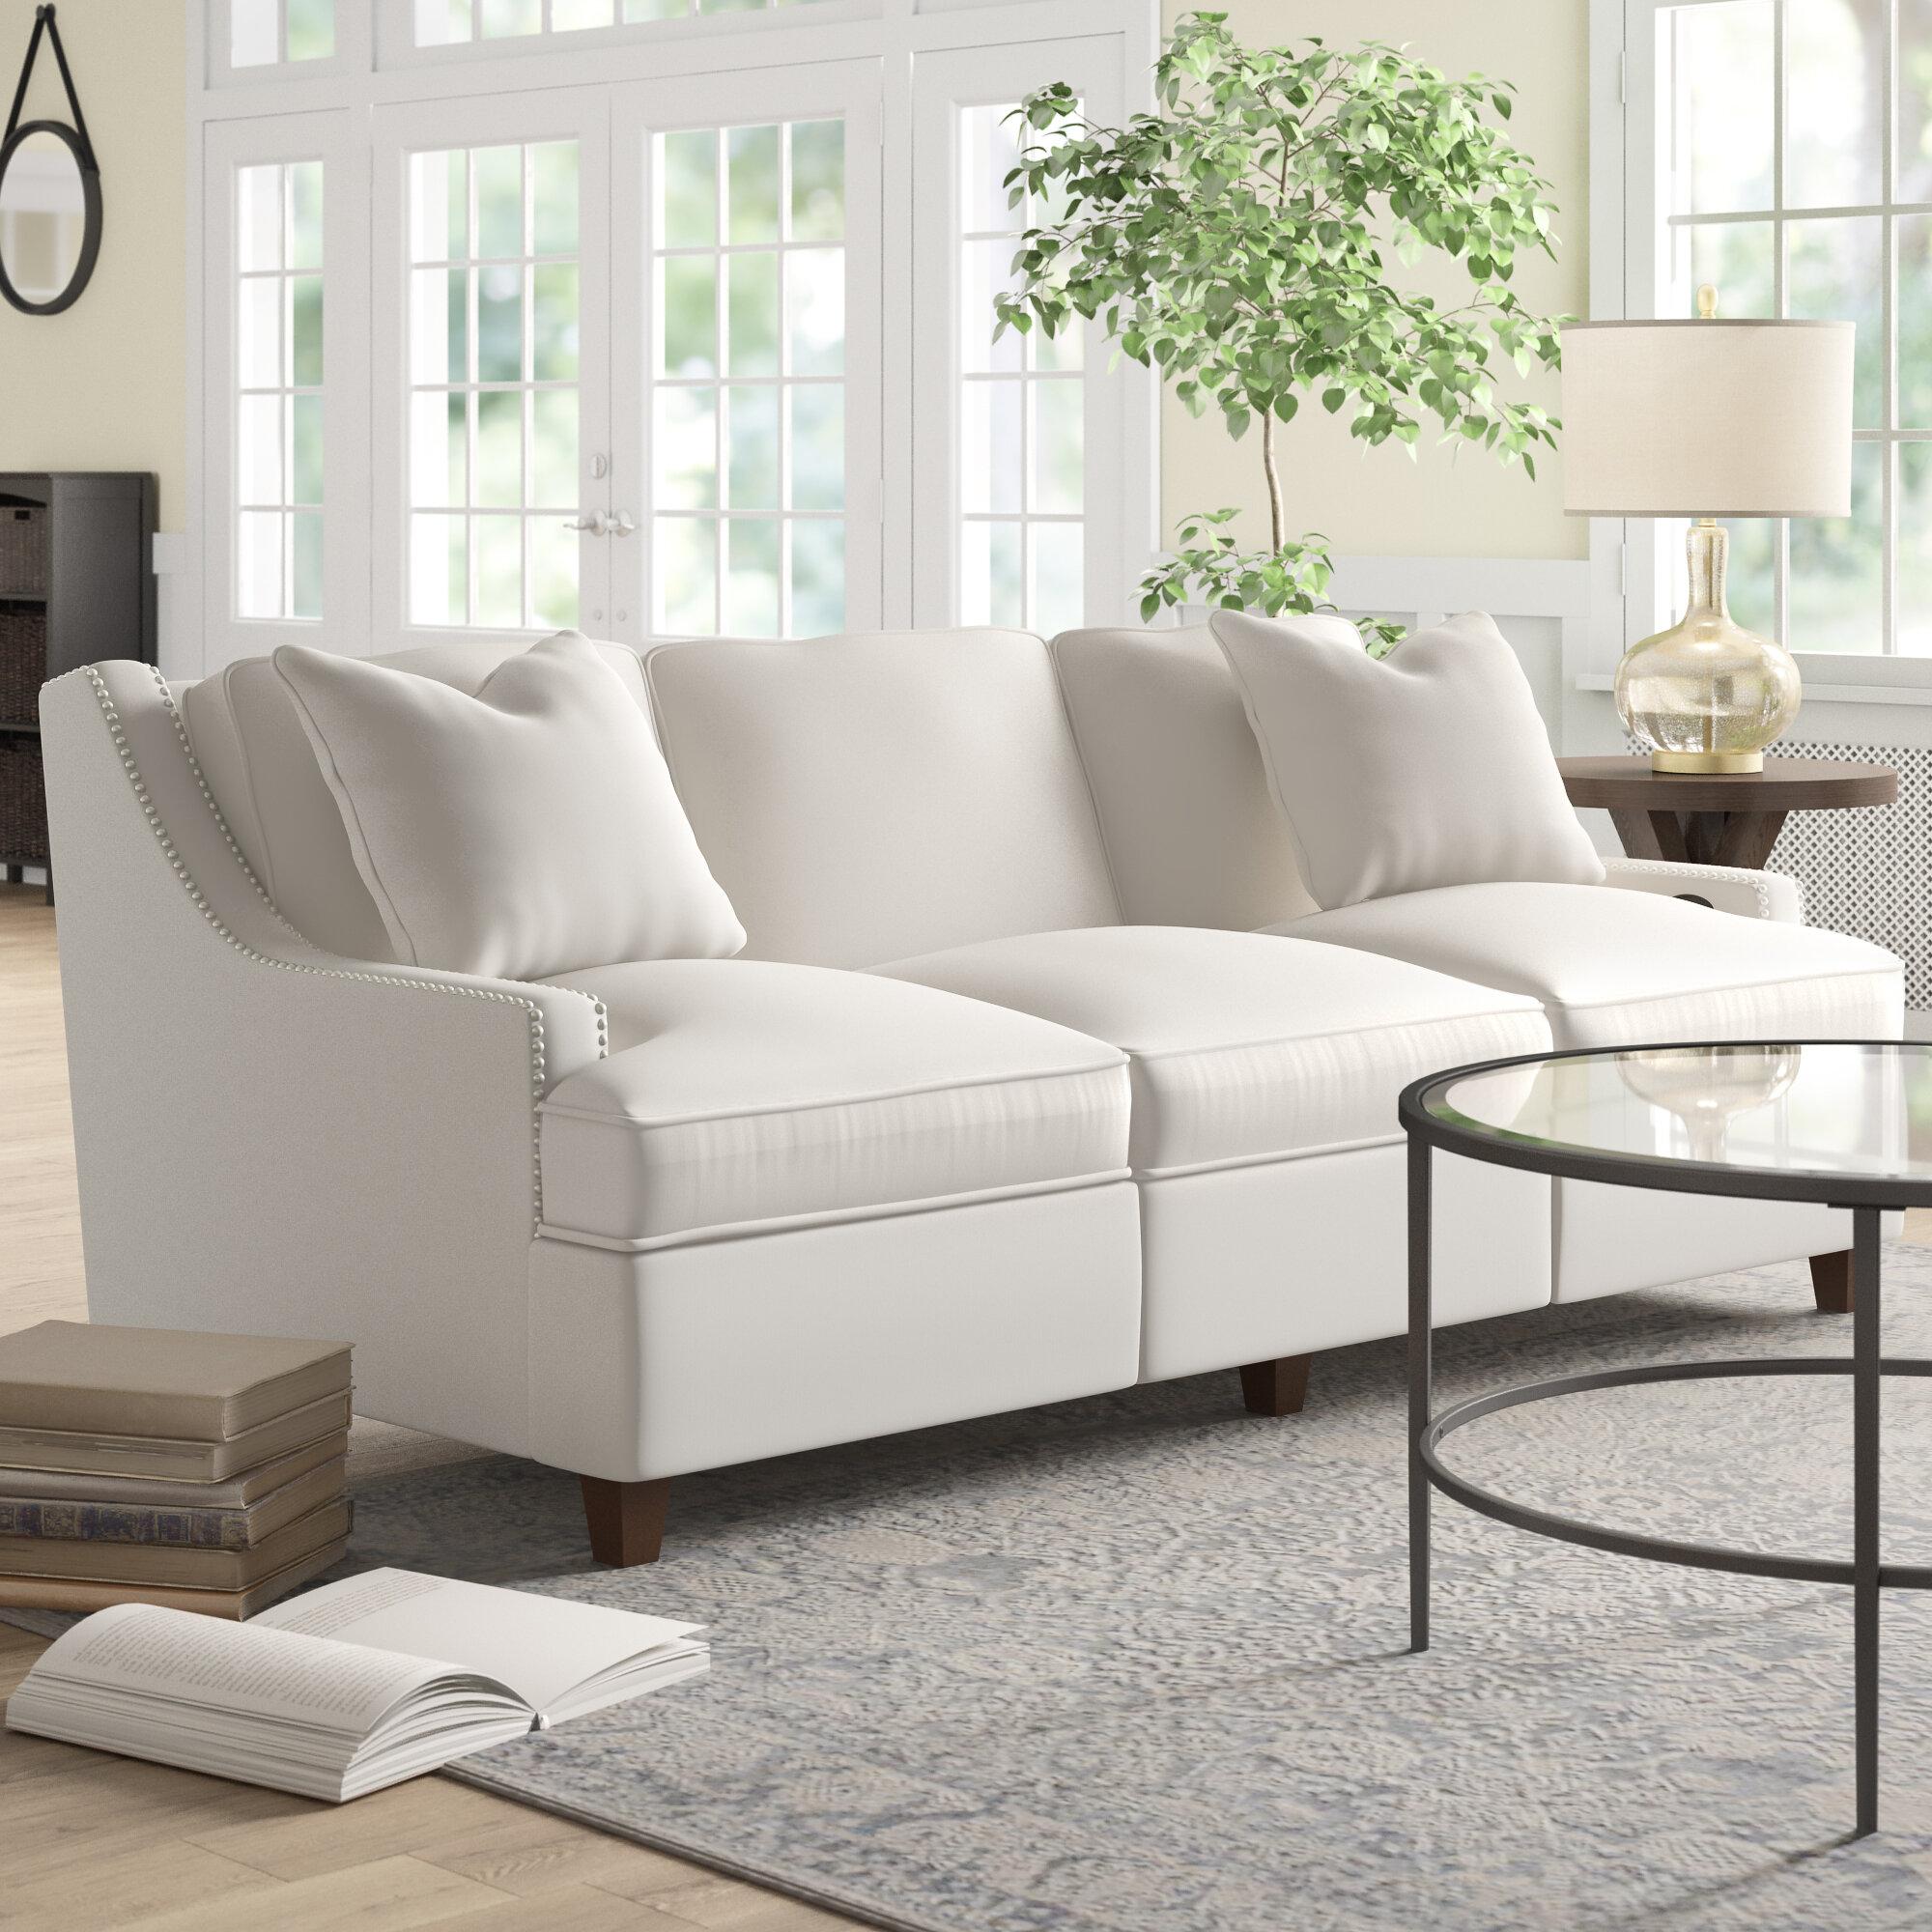 Wayfair Custom Upholstery Medora 83 Reclining Recessed Arm Sofa Birch Lane